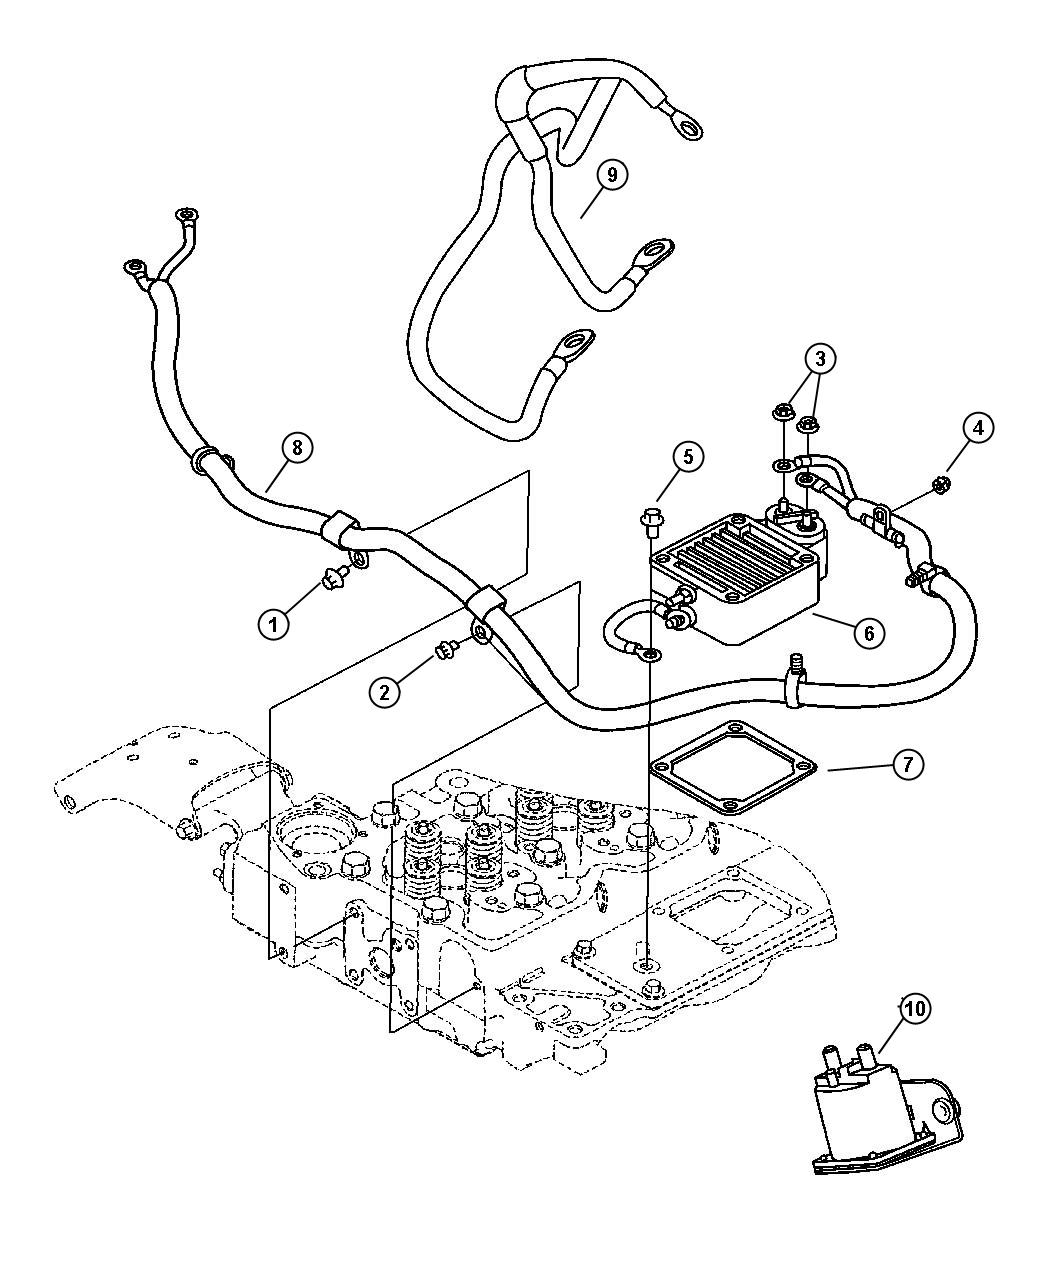 2007 Dodge Ram 3500 Wiring and Intake Heater Diesel.